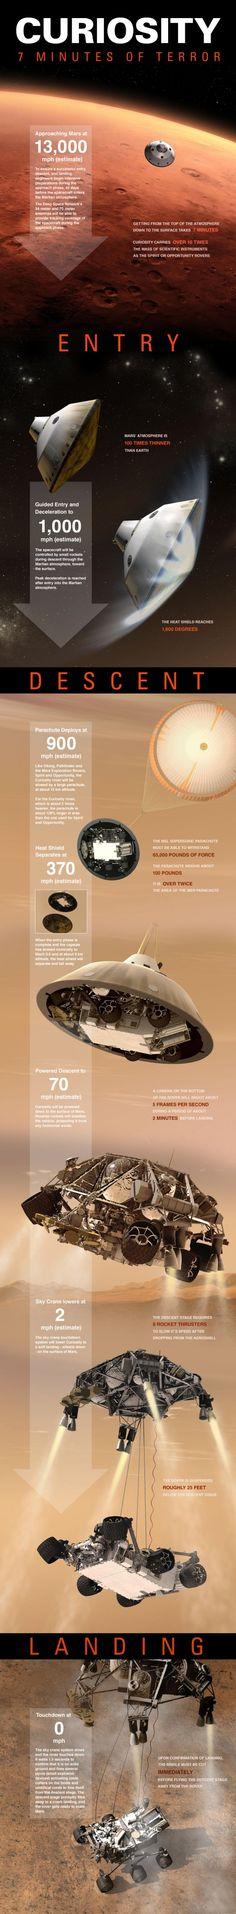 #INFOGRAPHIC: CURIOSITY MARS EXPLORATION – 7 MINUTES OF TERROR